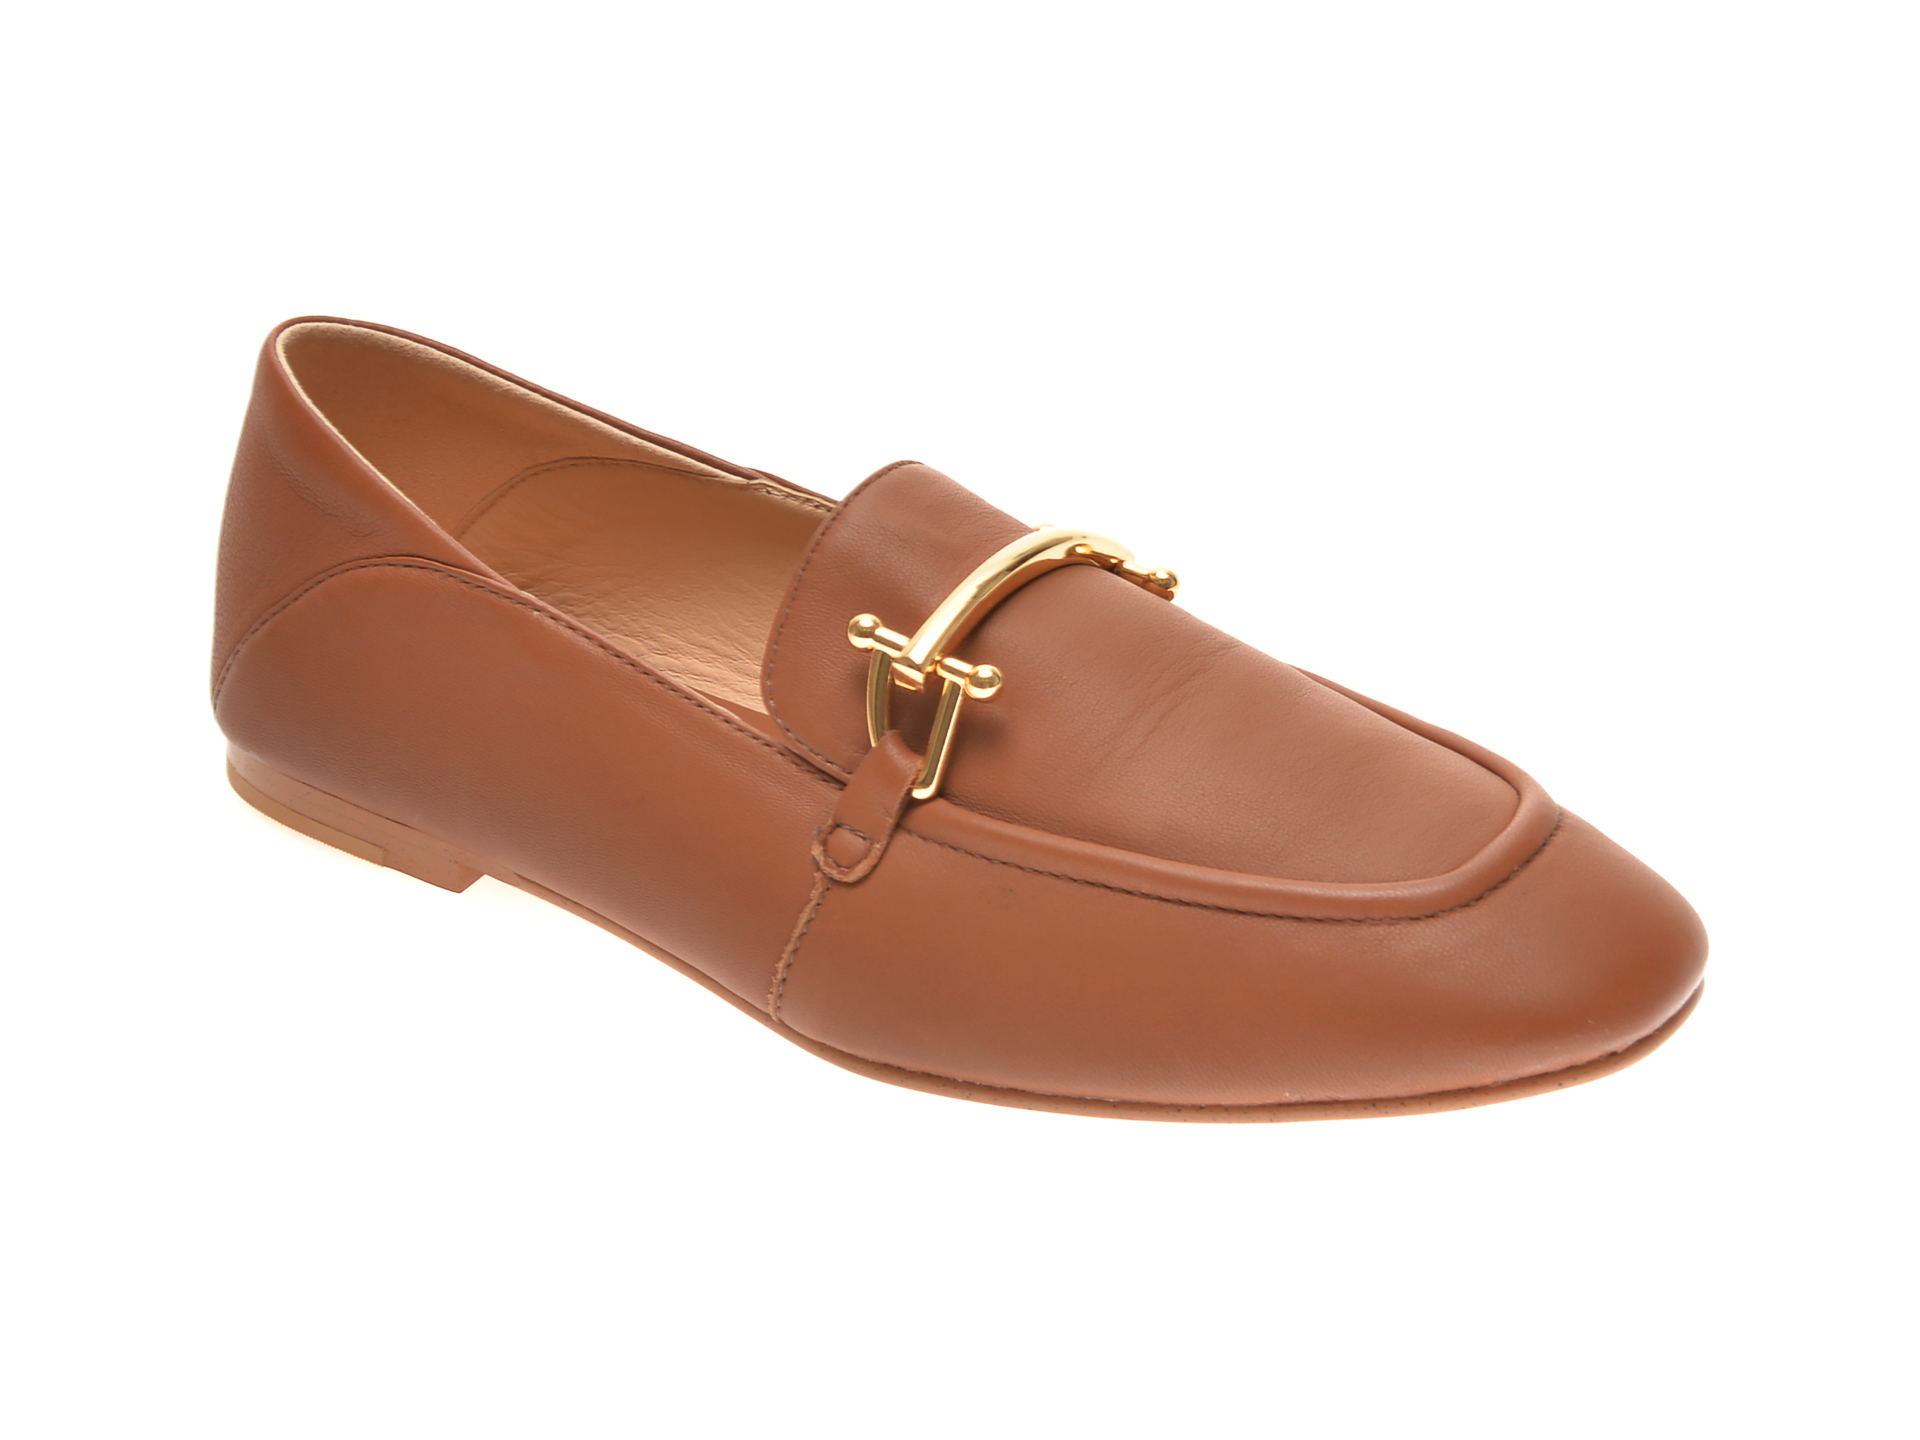 Pantofi CLARKS maro, PURE 2 LOAFER, din piele naturala imagine